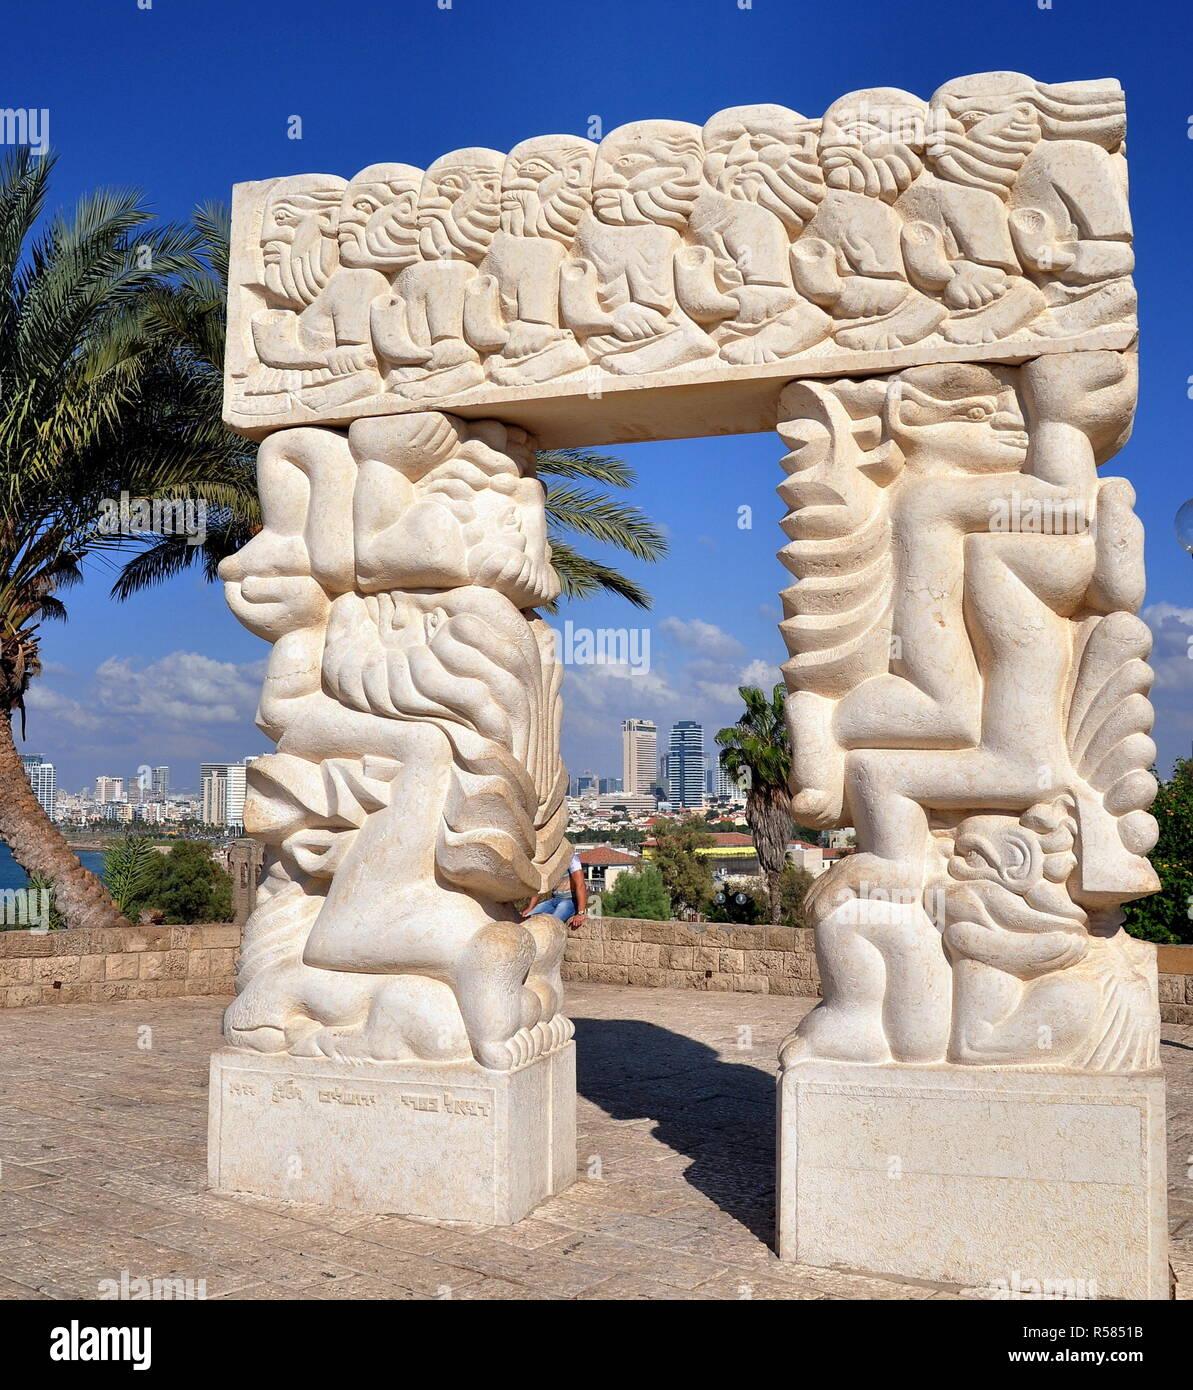 tel aviv - gate of faith in abrasha park of old jaffa Stock Photo